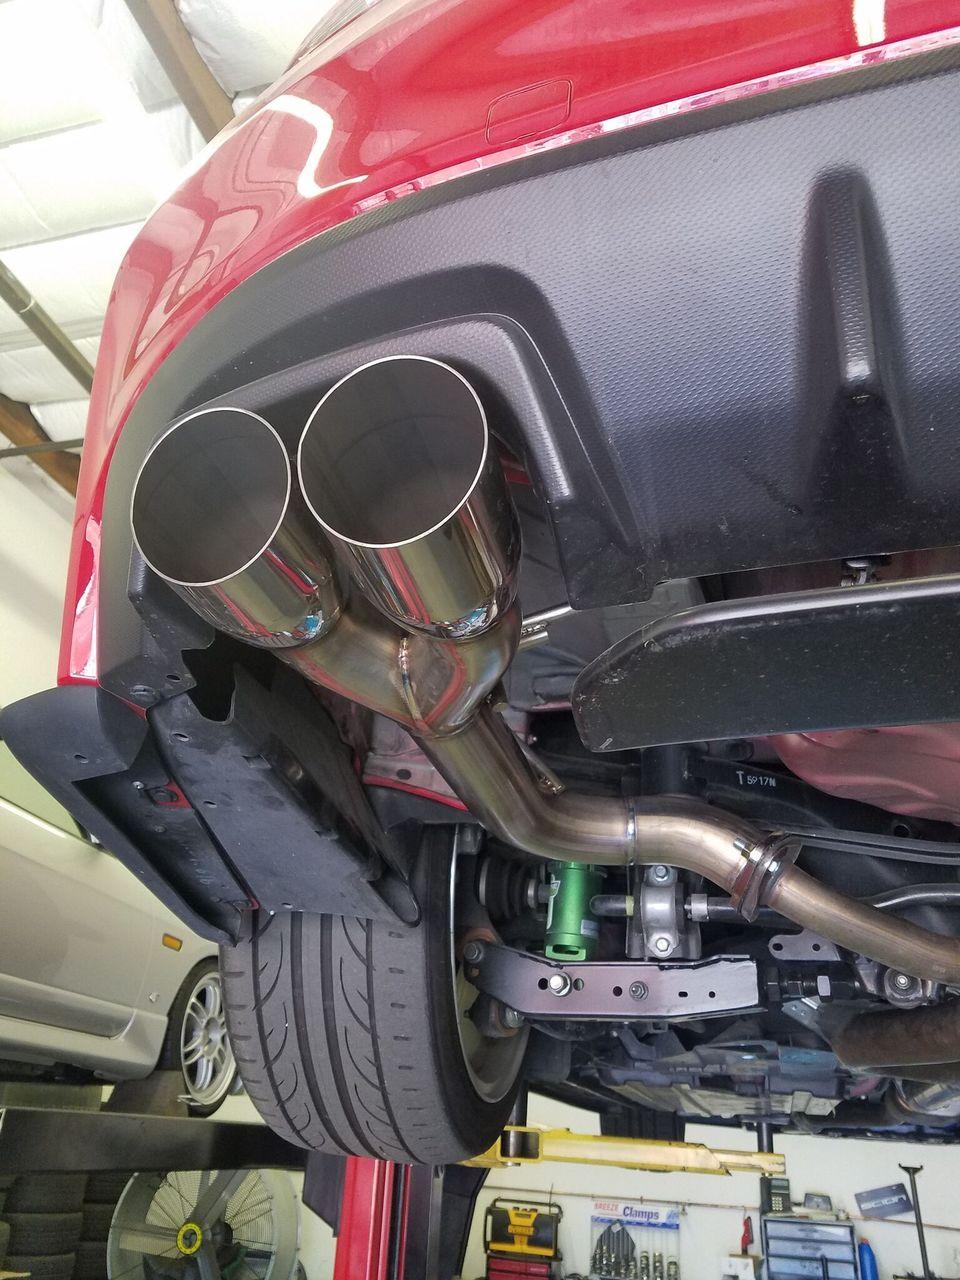 blox racing exhaust muffler delete single wall stainless quad tips subaru wrx sti 2015 2018